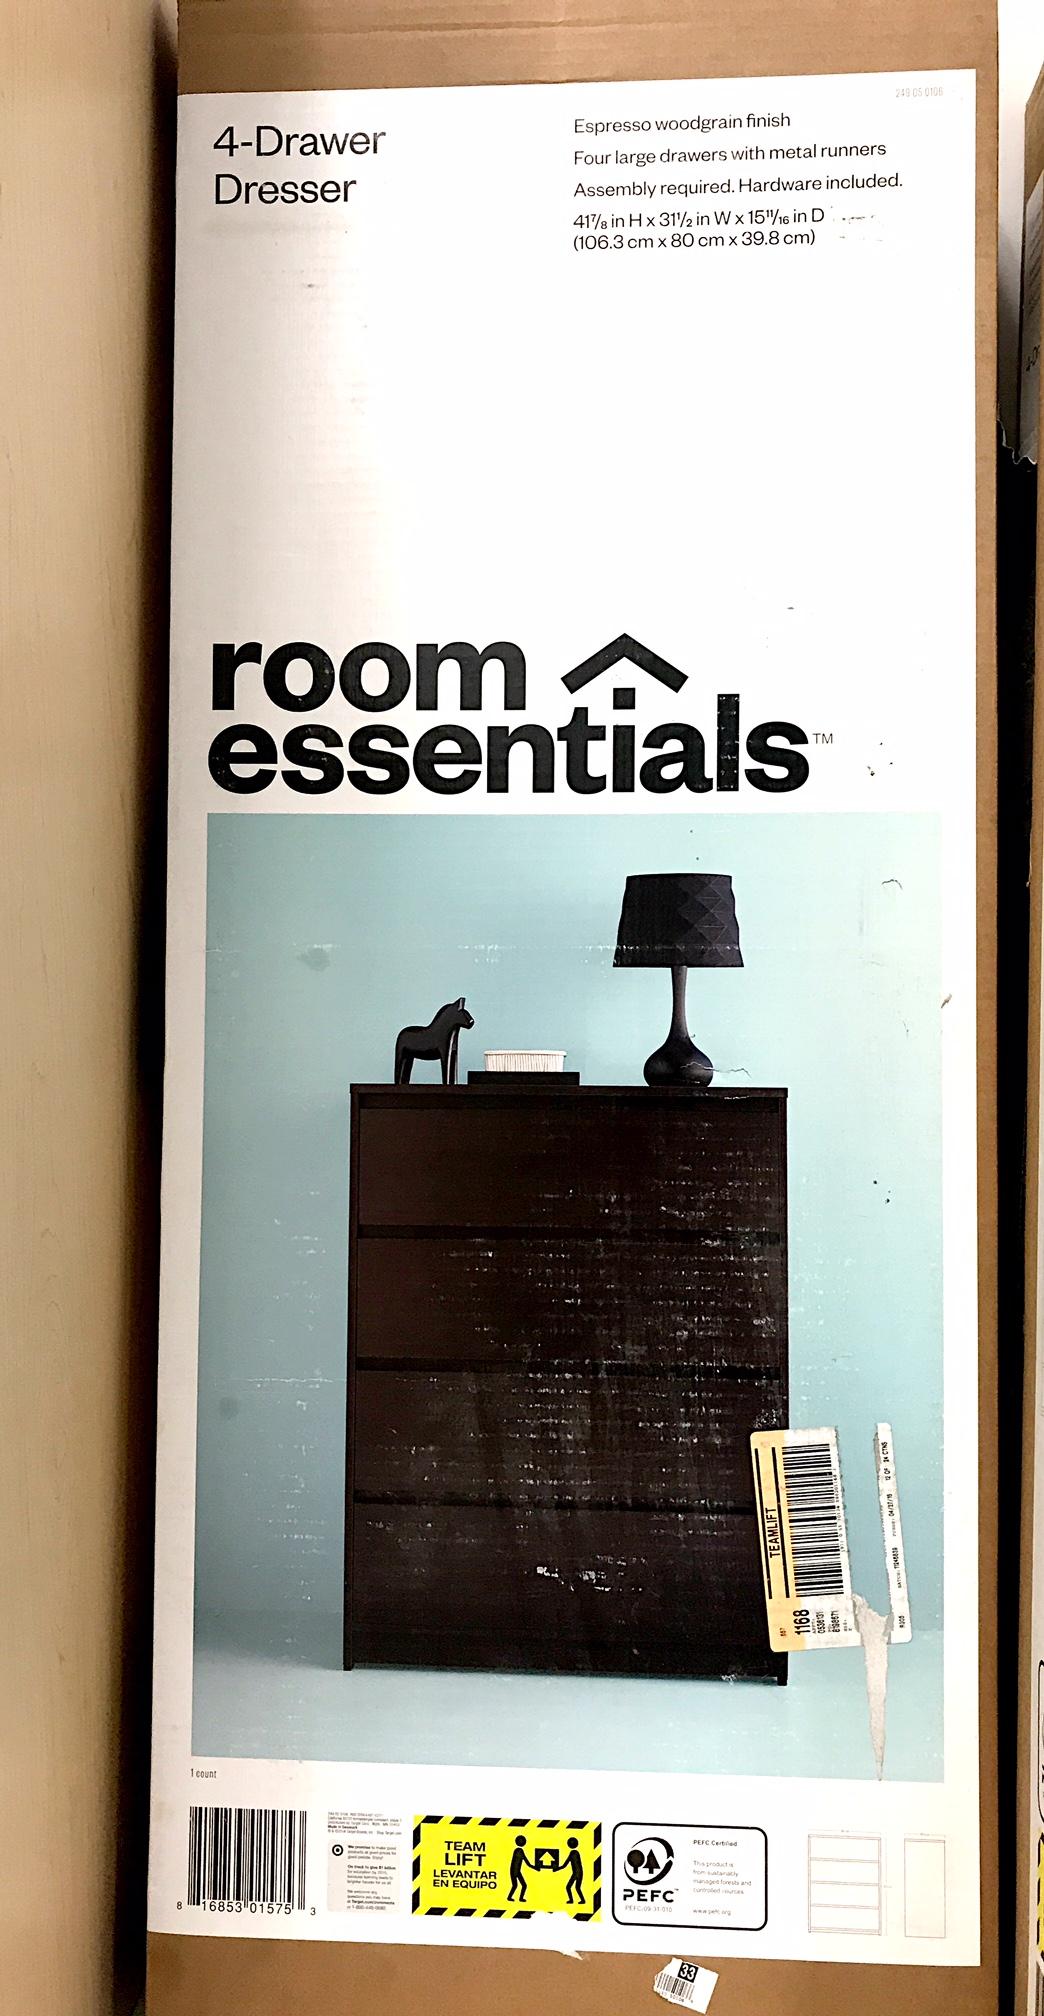 Target Recalls Room Essentials 4 Drawer Dressers Due To Tip